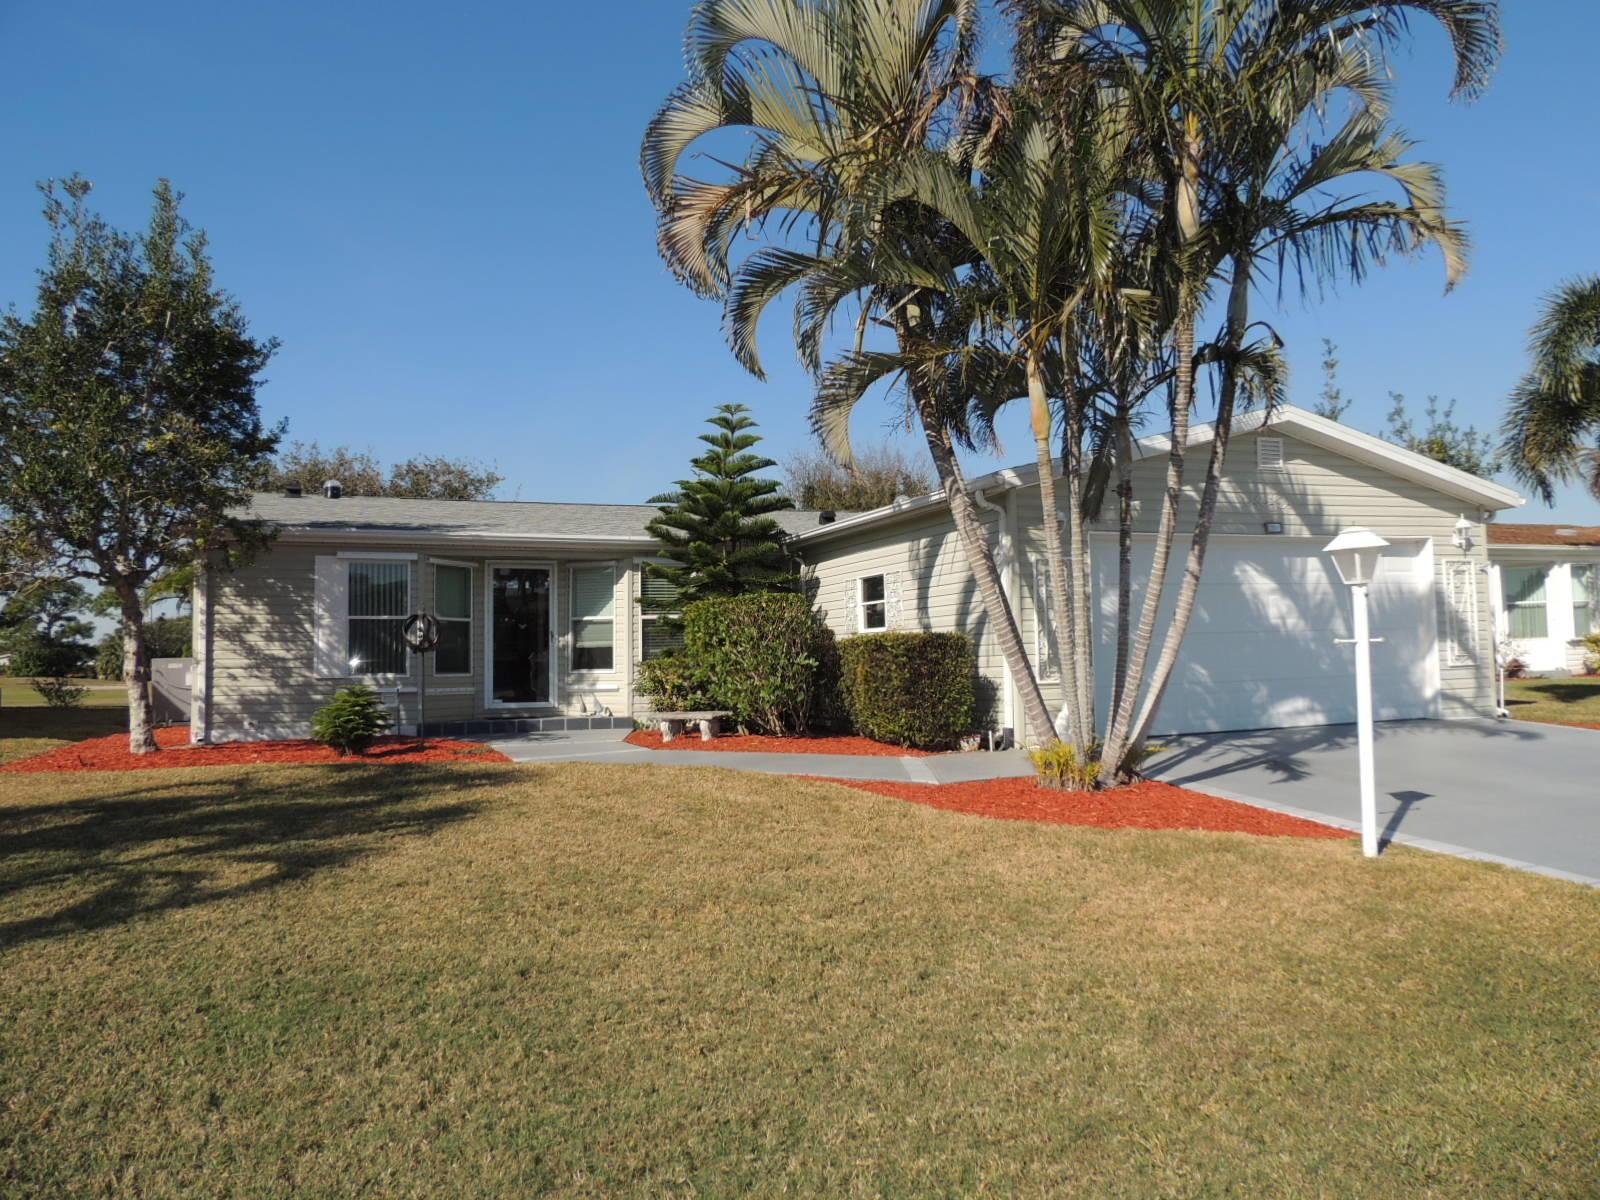 7909 Mcclintock Way, Port Saint Lucie, FL 34952